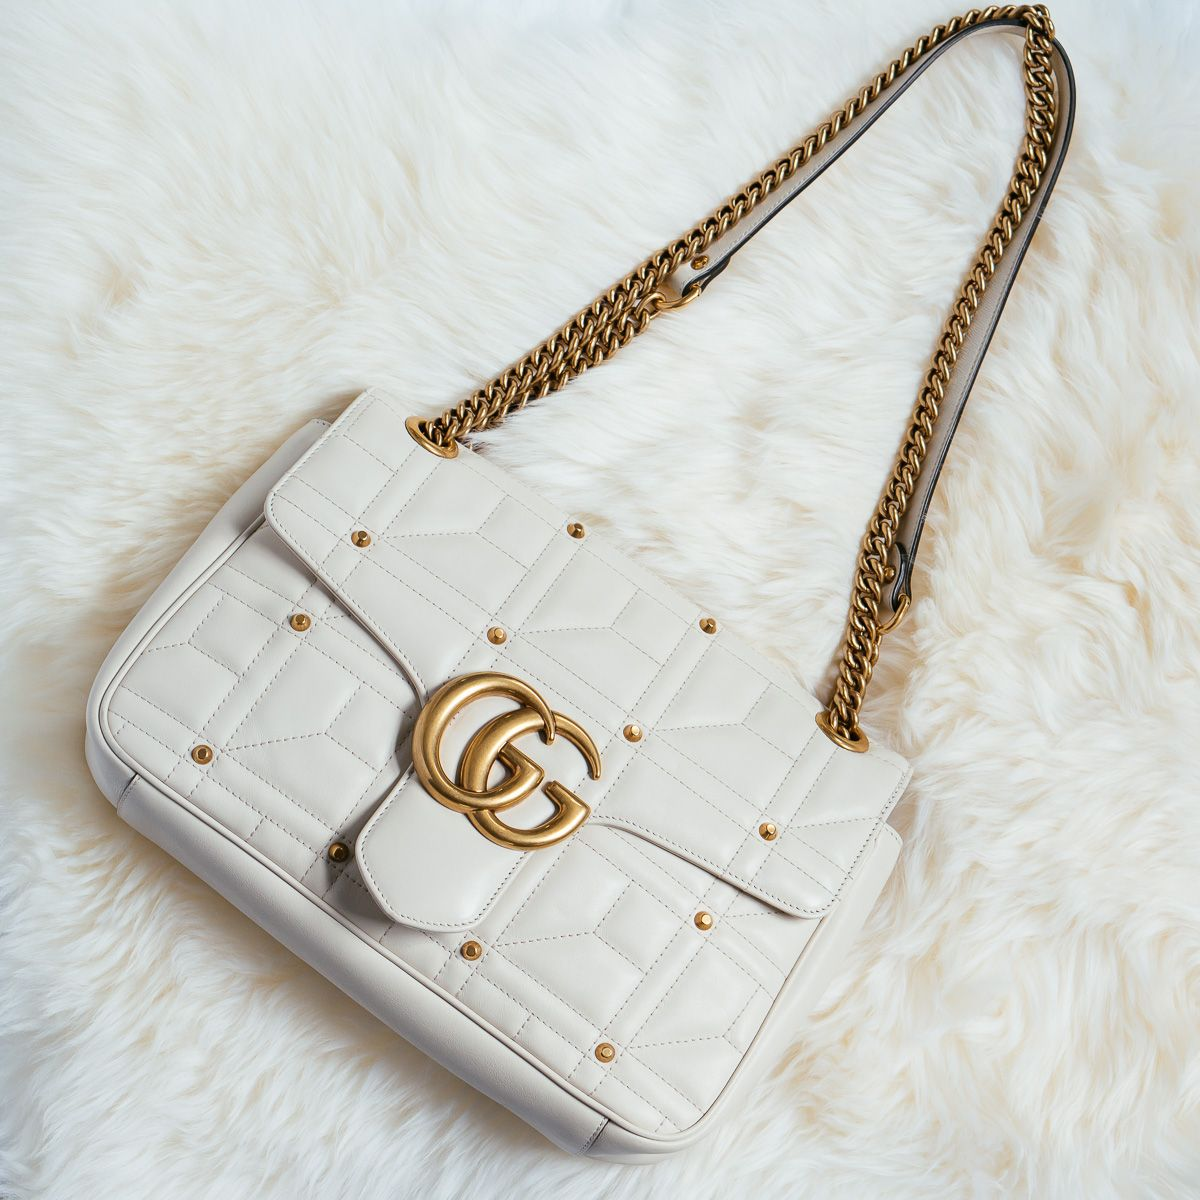 a9d4f5ea6713 Perfect Pairs: Gucci Marmont and Gucci Velvet Evening Slipper - PurseBlog